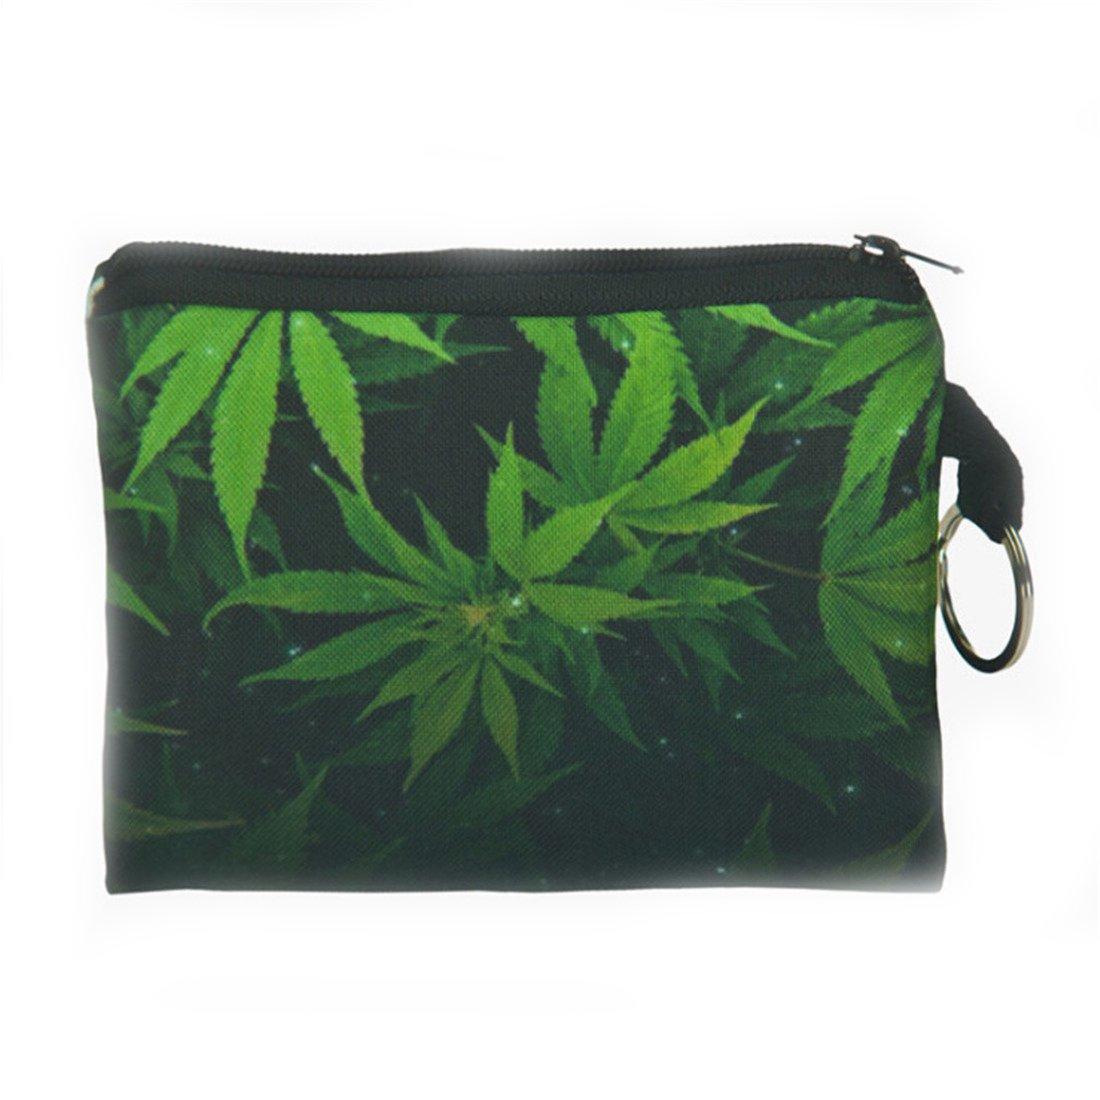 VWH Small Storage Bag Weed Leaf Printed Handbag Zip Coin Bag Case Key Card Holder Purse Wallet